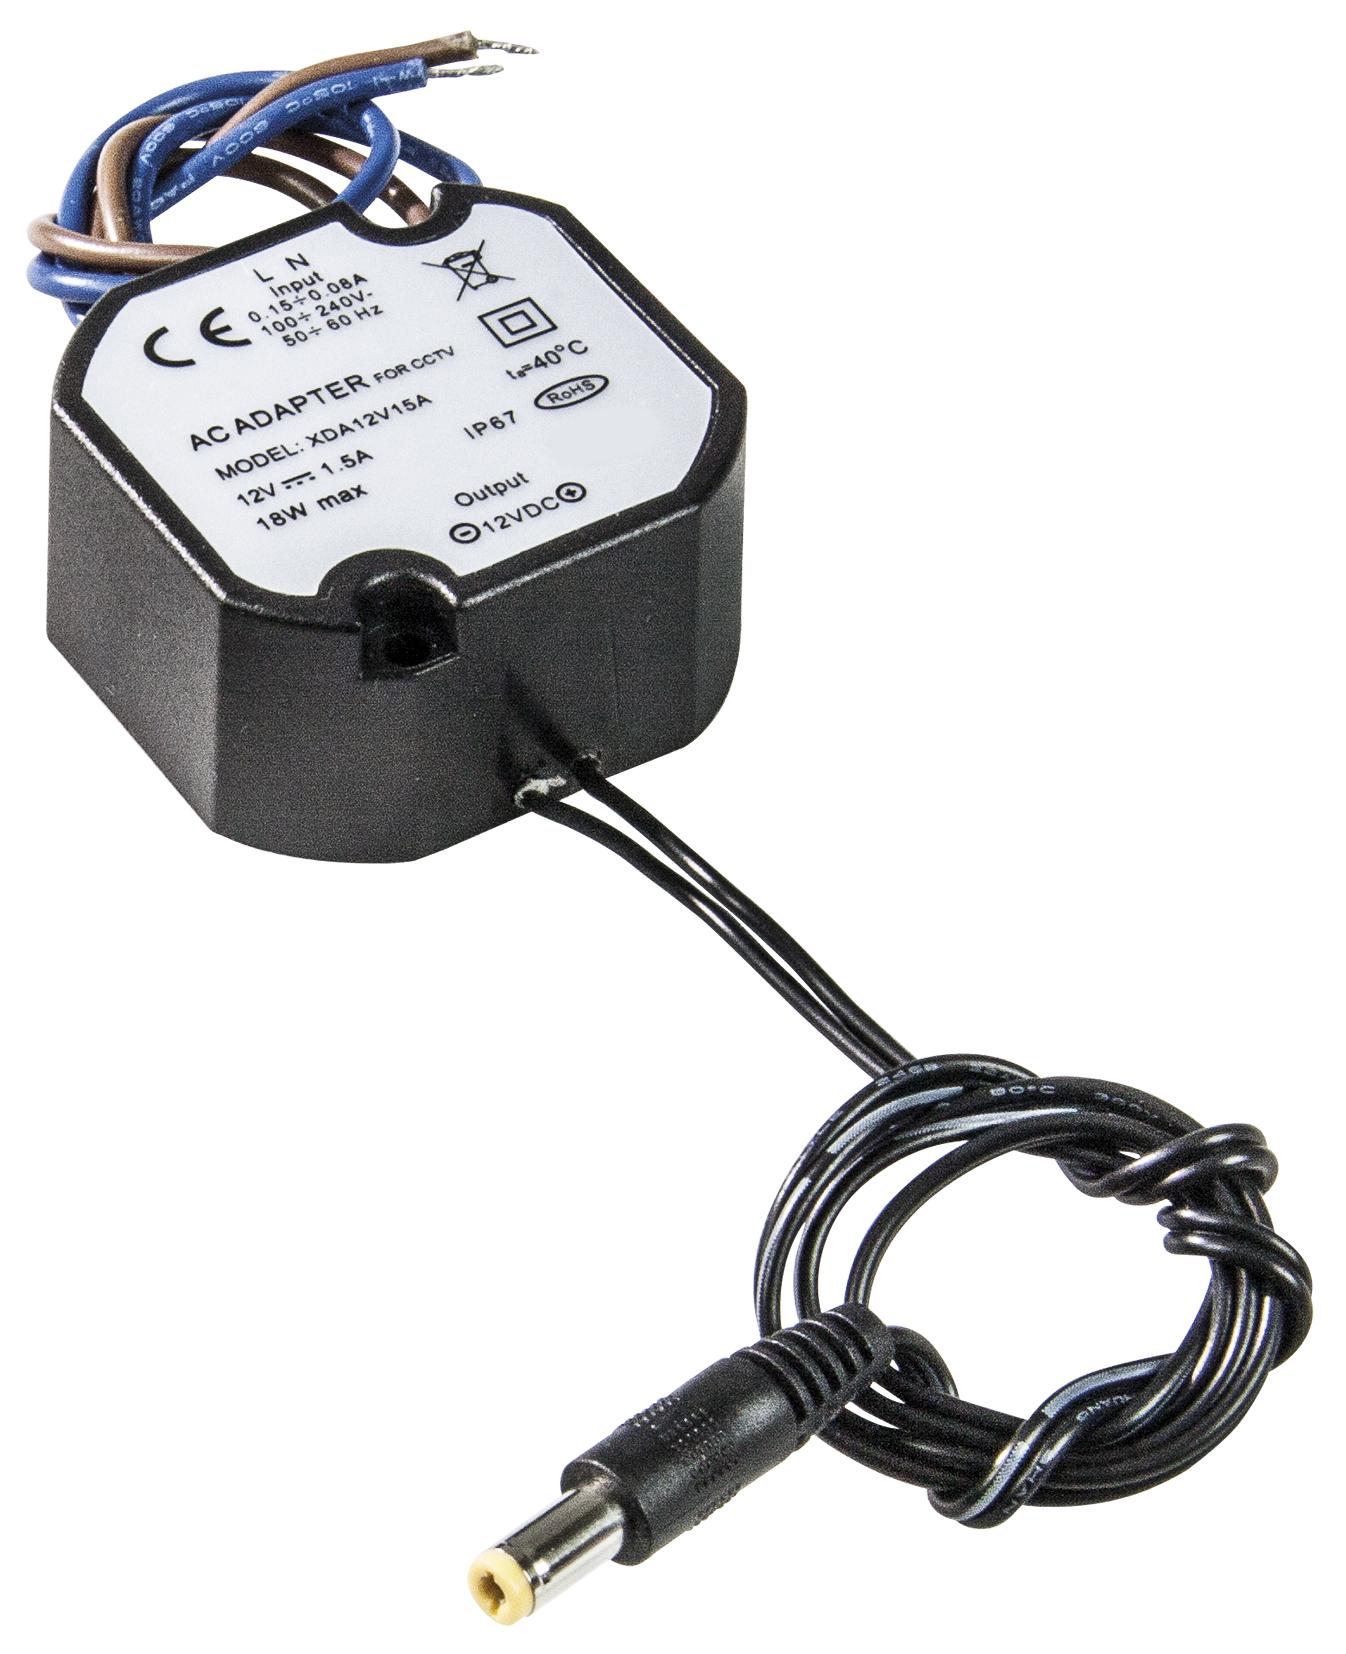 PQZATX Inverter di Alimentazione 150 W da 12V a CA 220 V Adattatore di Tensione per Uscita Auto con Porte di Ricarica USB da 0,5 A